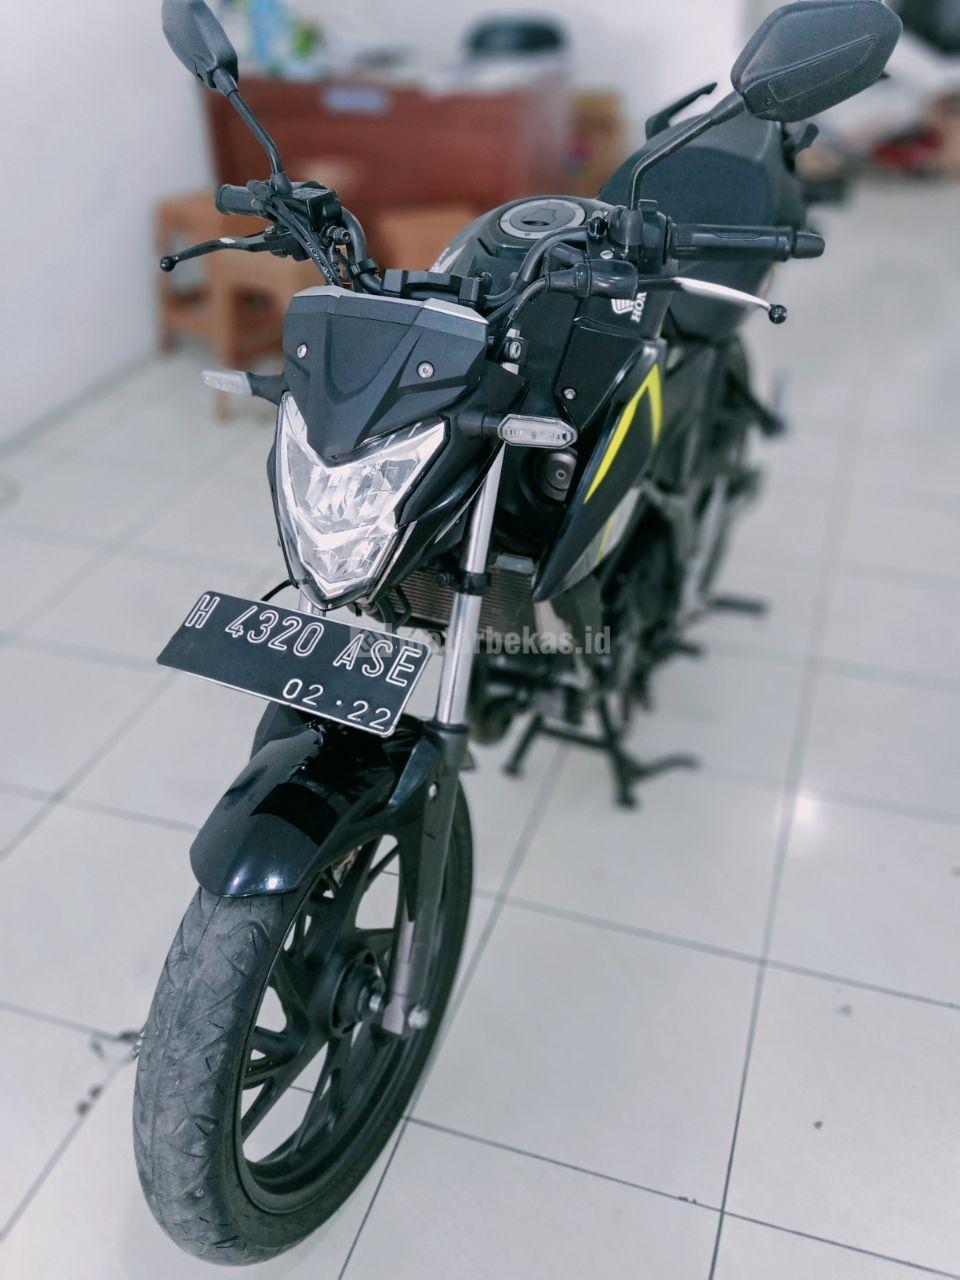 HONDA CB150R 2017 FI 2396 motorbekas.id